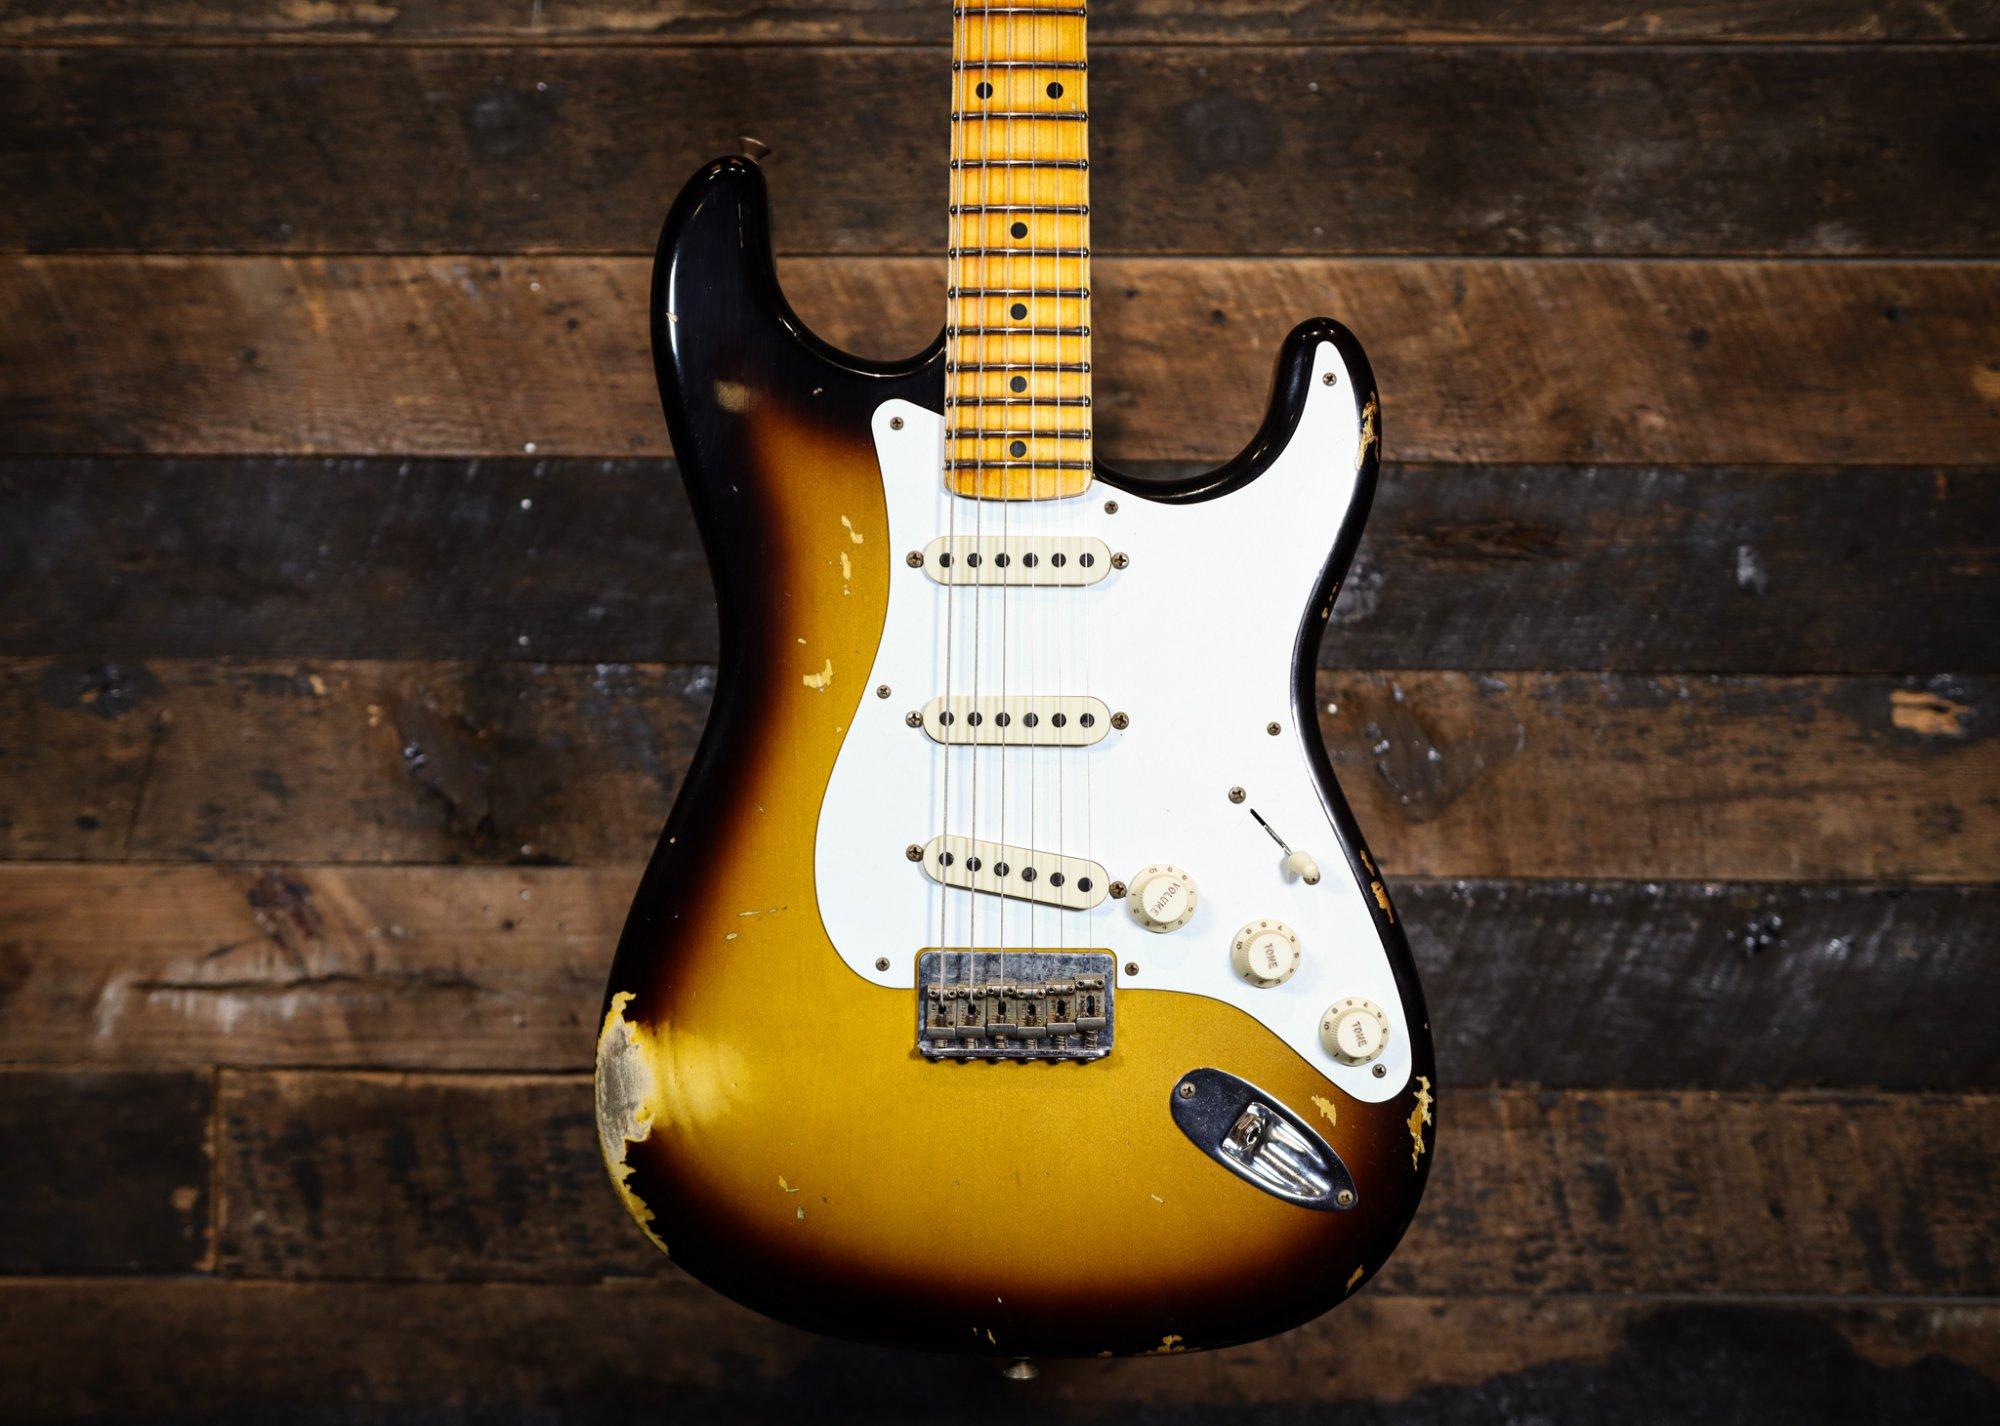 Fender Custom Shop Limited Edition 56' Troposphere Stratocaster Super Faded Aged Heavy Relic 2 tone Sunburst